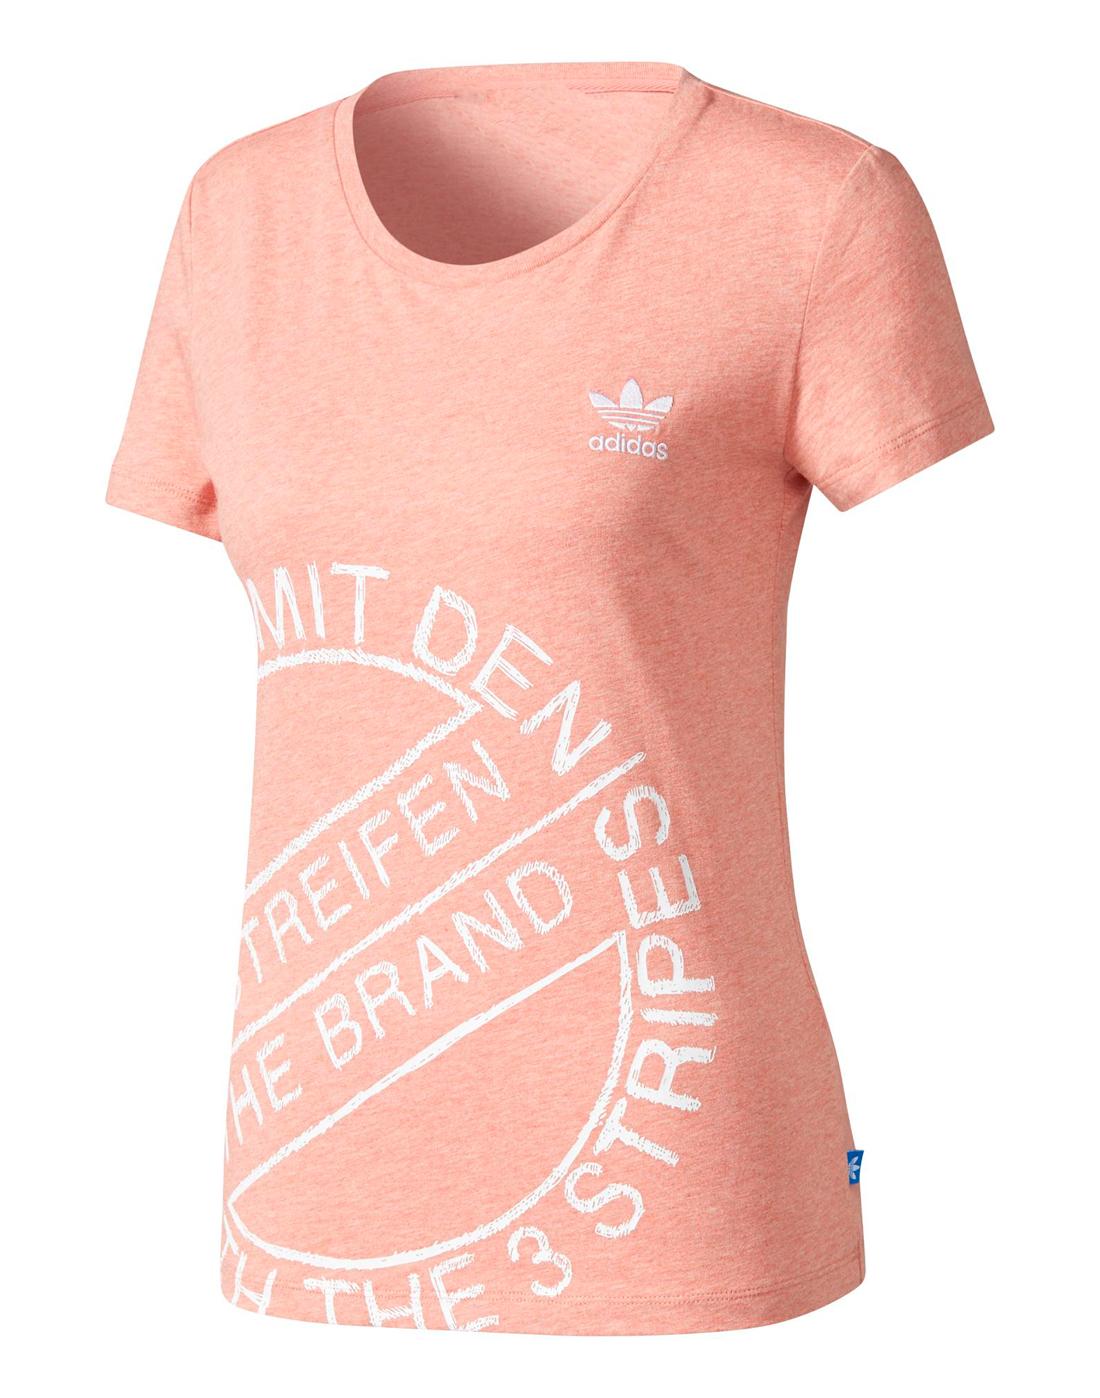 b1133b2fda3 Adidas T Shirt Womens Sale - DREAMWORKS